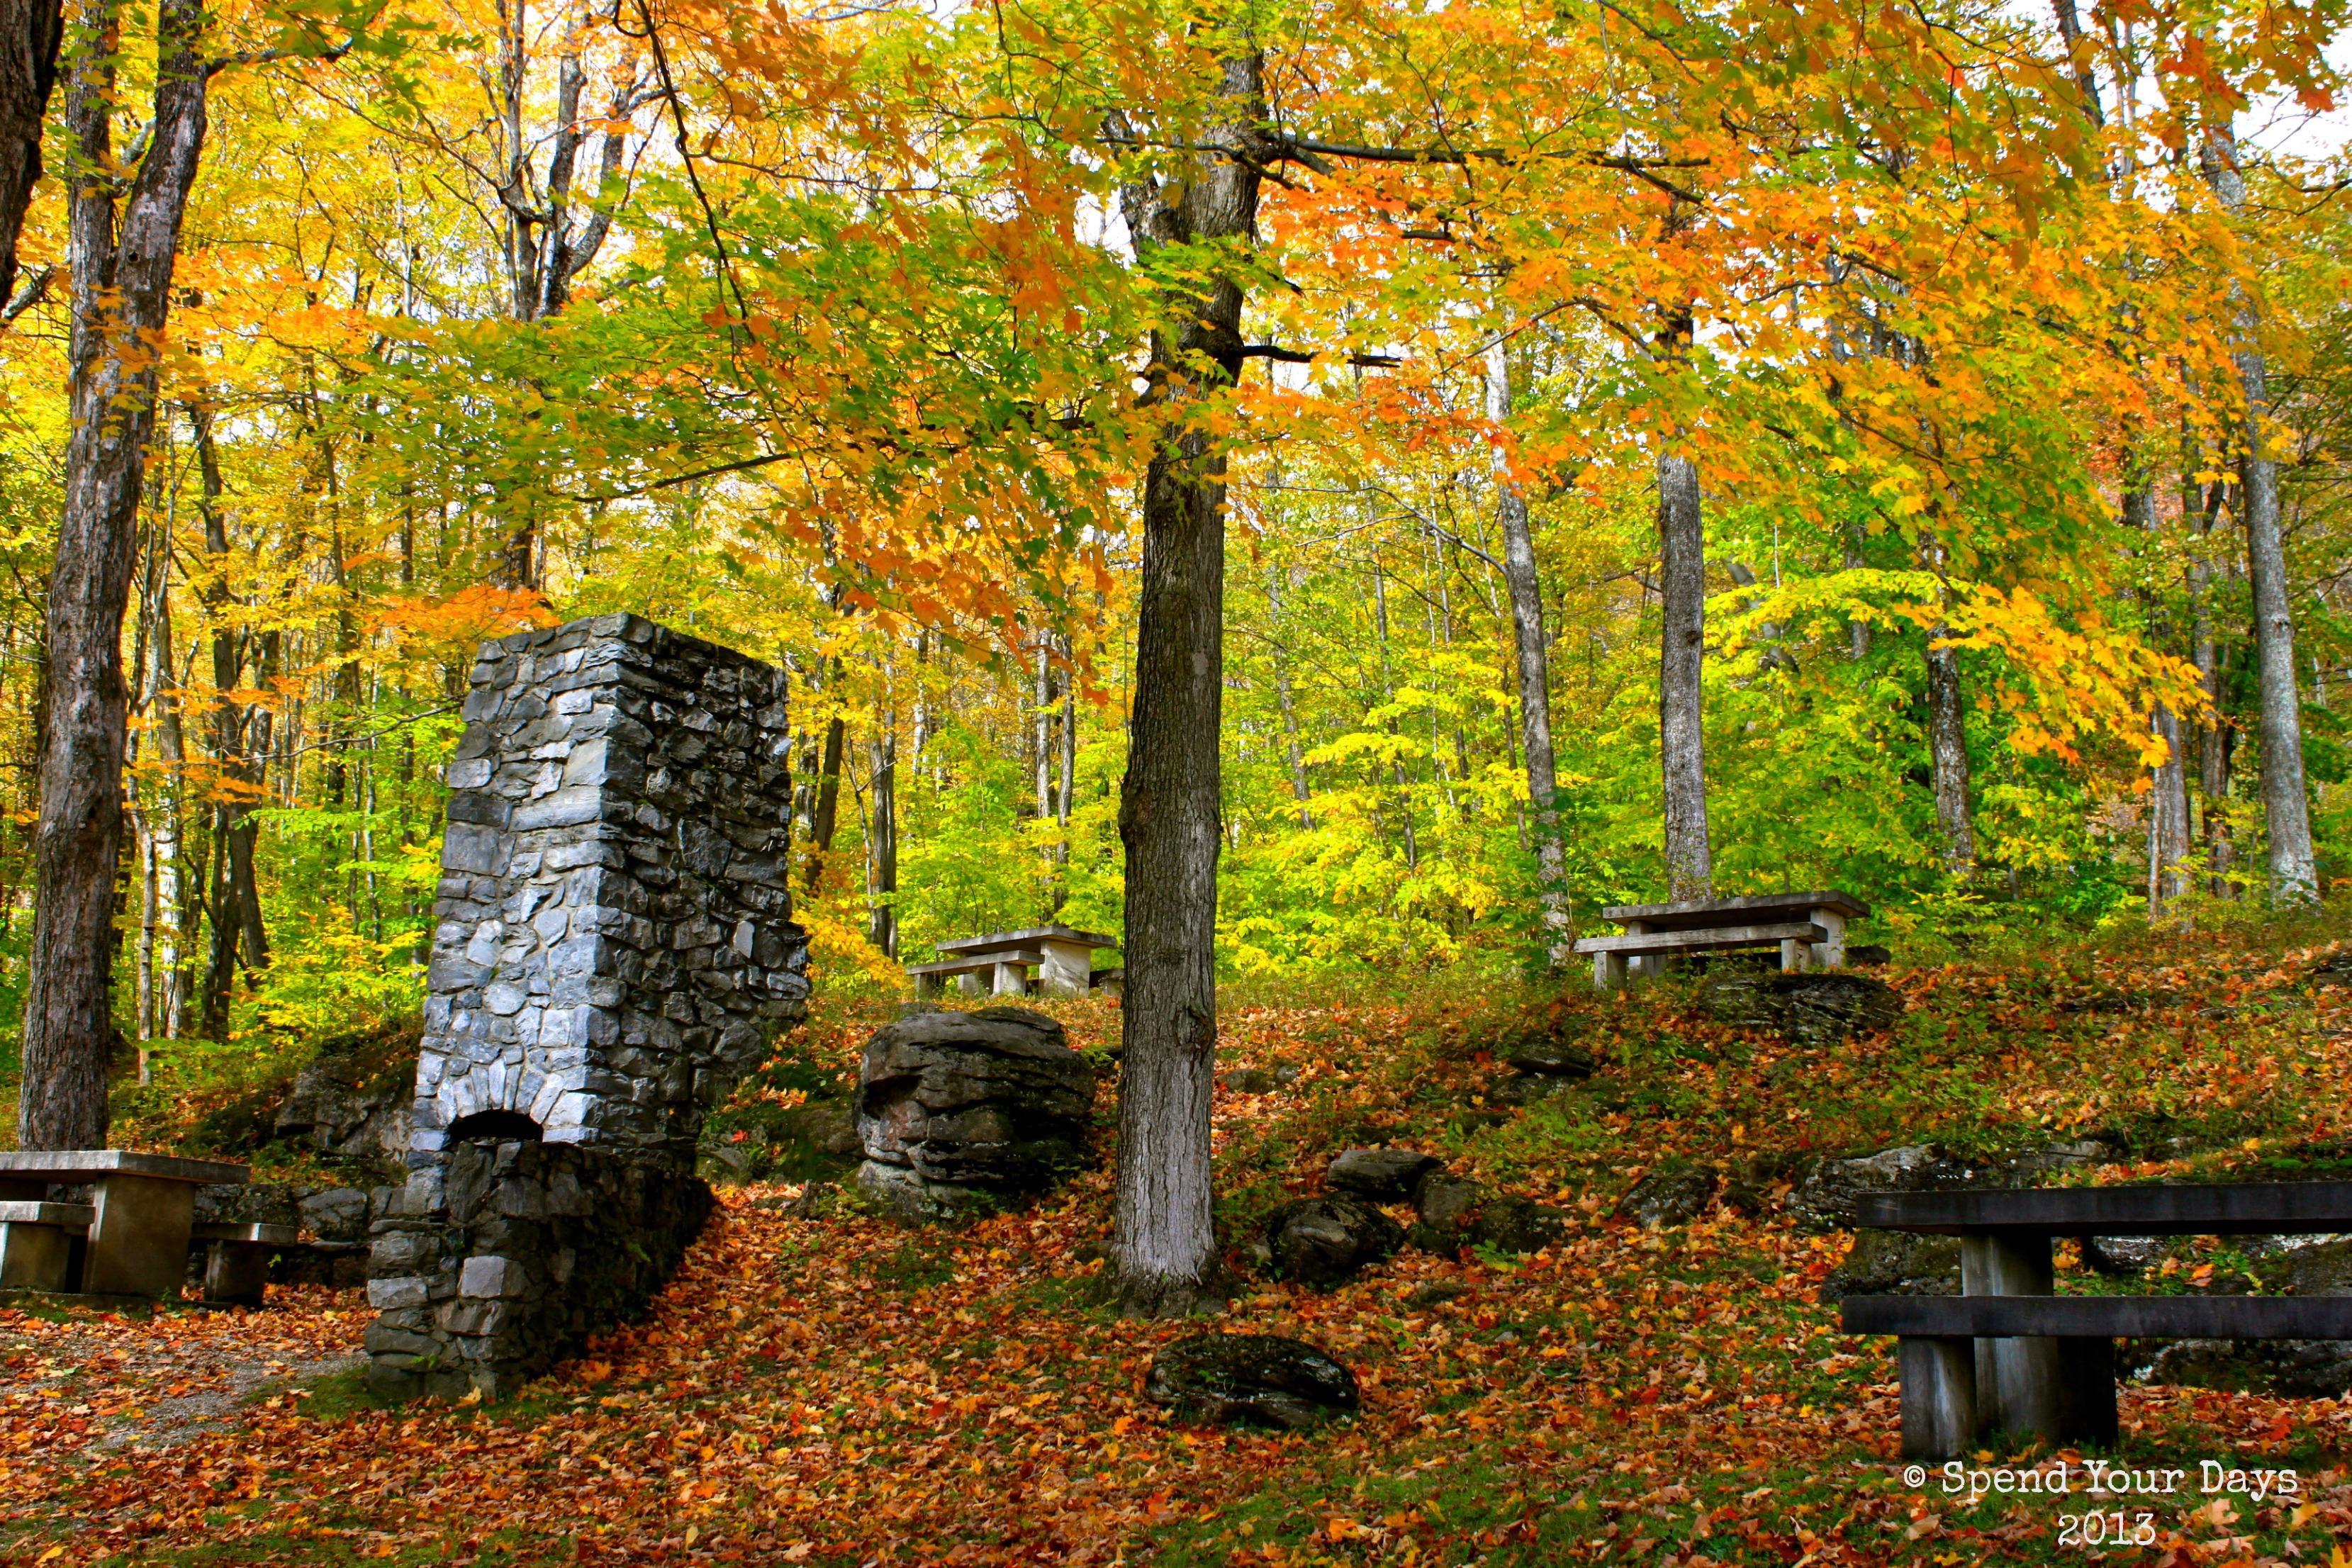 mt equinox manchester vermont autumn foliage